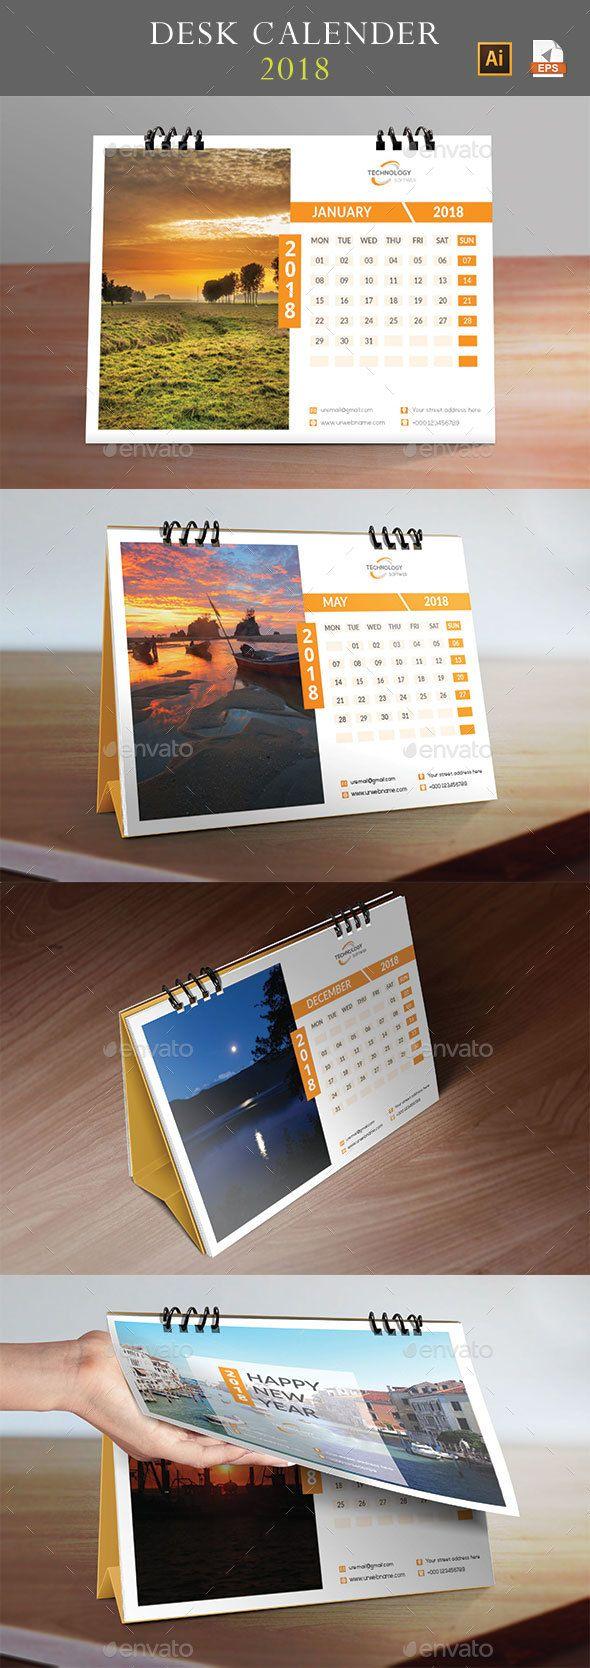 Desk Calendar 2018 | Calendar 2018, Desk calendars and Ai illustrator